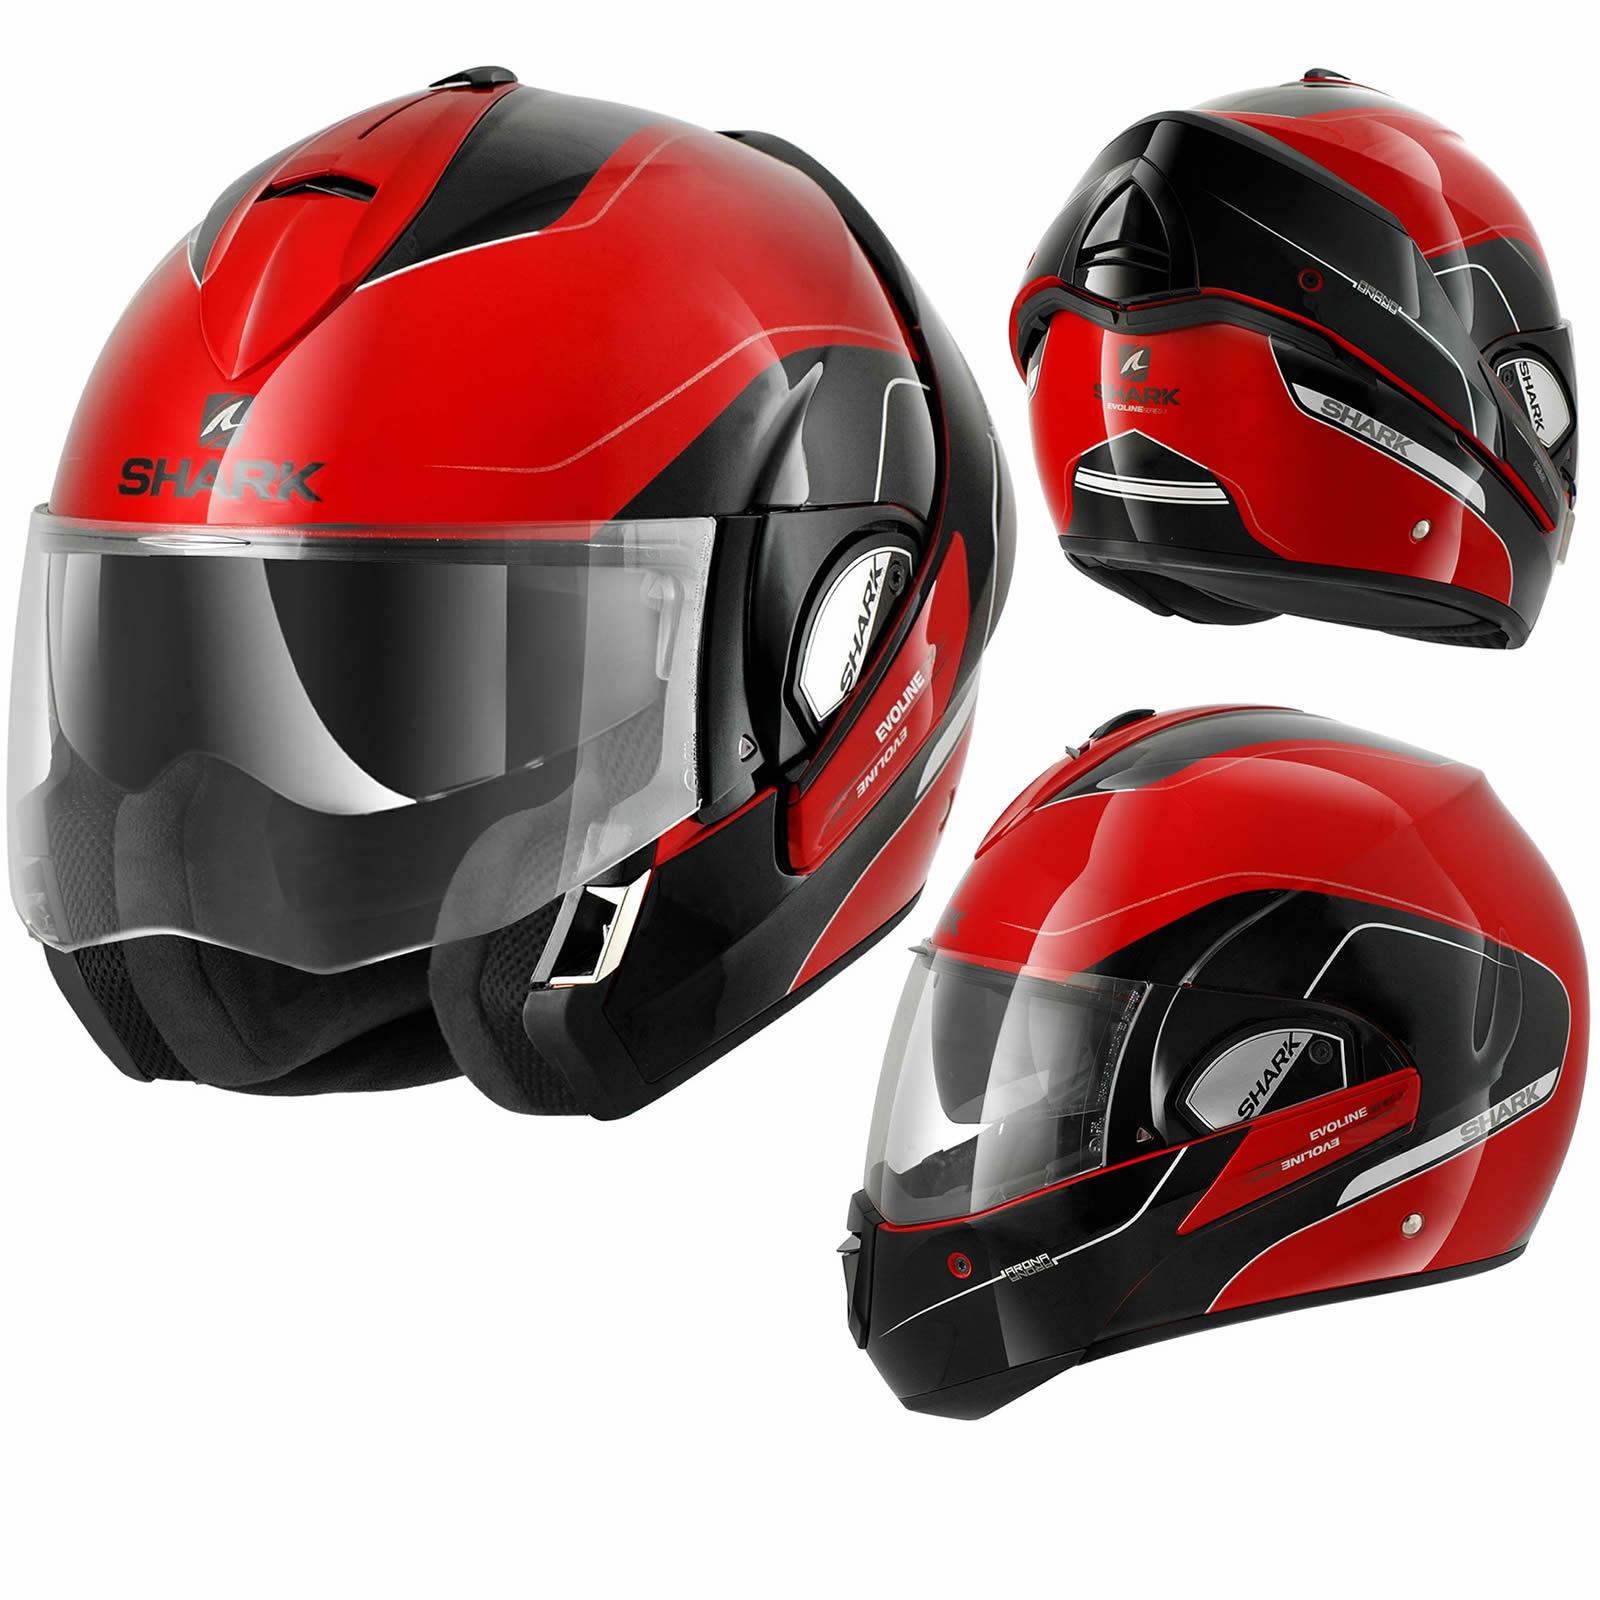 shark evoline series 3 arona motorcycle helmet flip front helmets. Black Bedroom Furniture Sets. Home Design Ideas